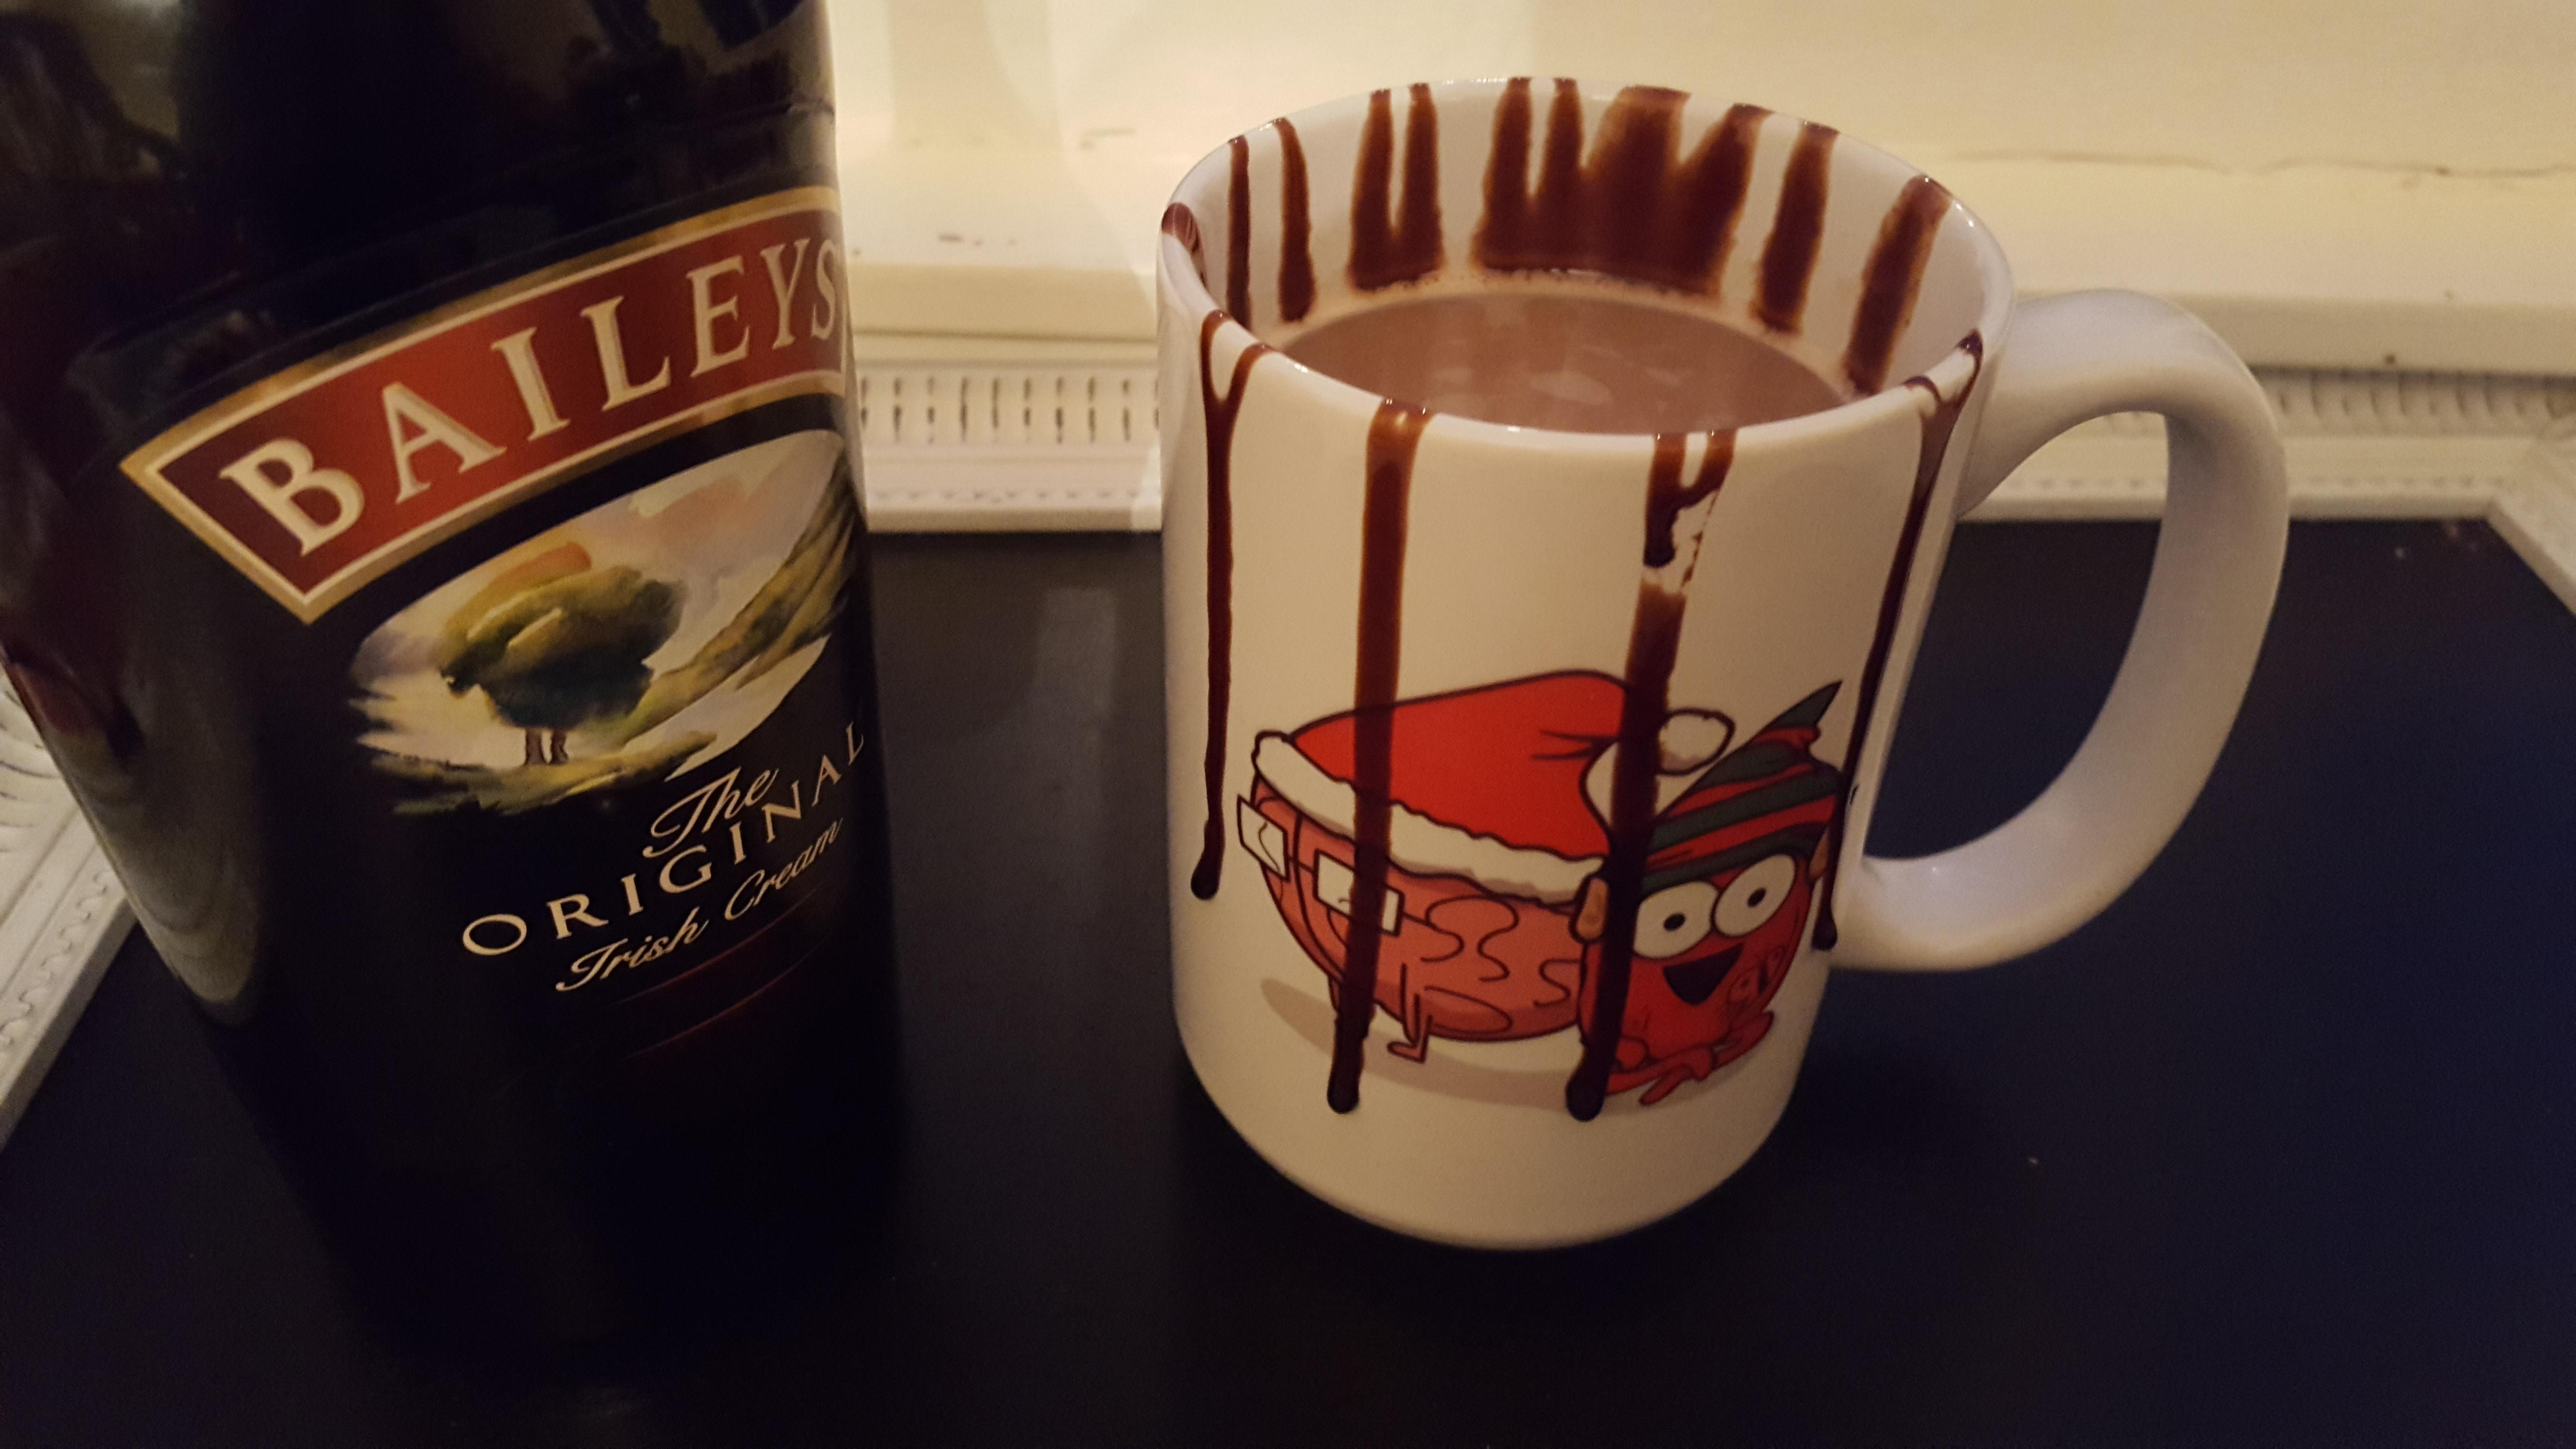 Baileys Hot Chocolate Rebekah Rose Hills